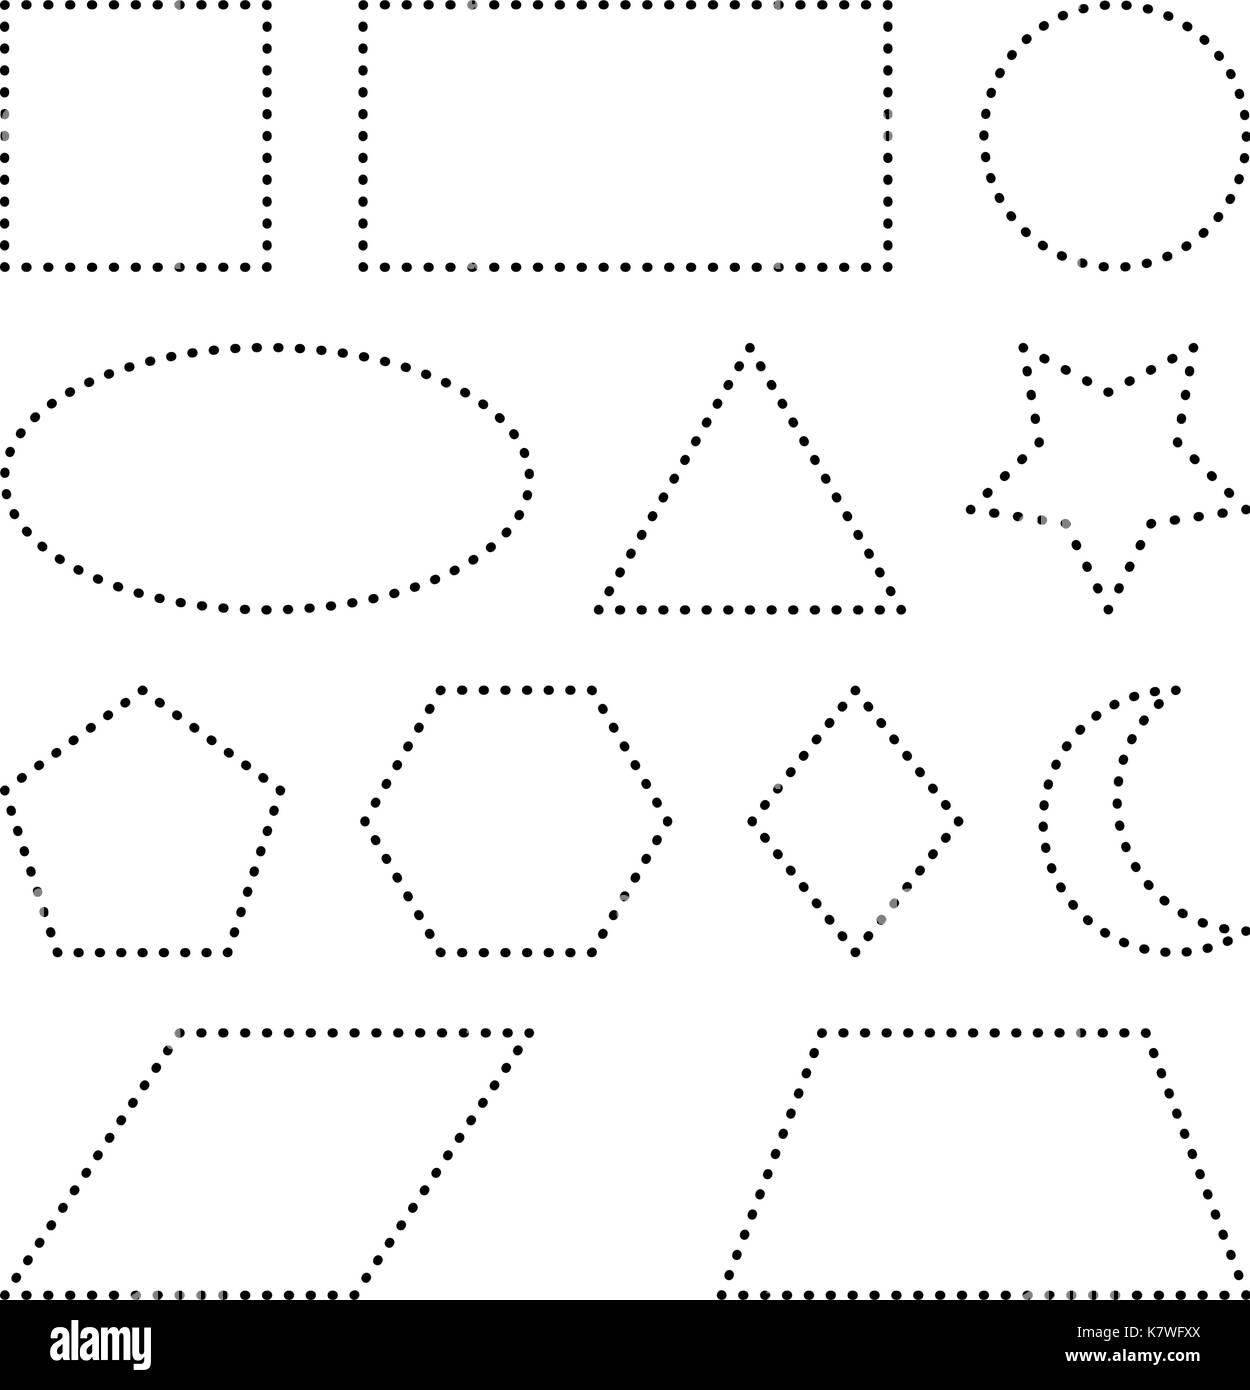 Geometrischen Grundformen Quadrat, Kreis, Oval, Dreieck, Sechseck ...